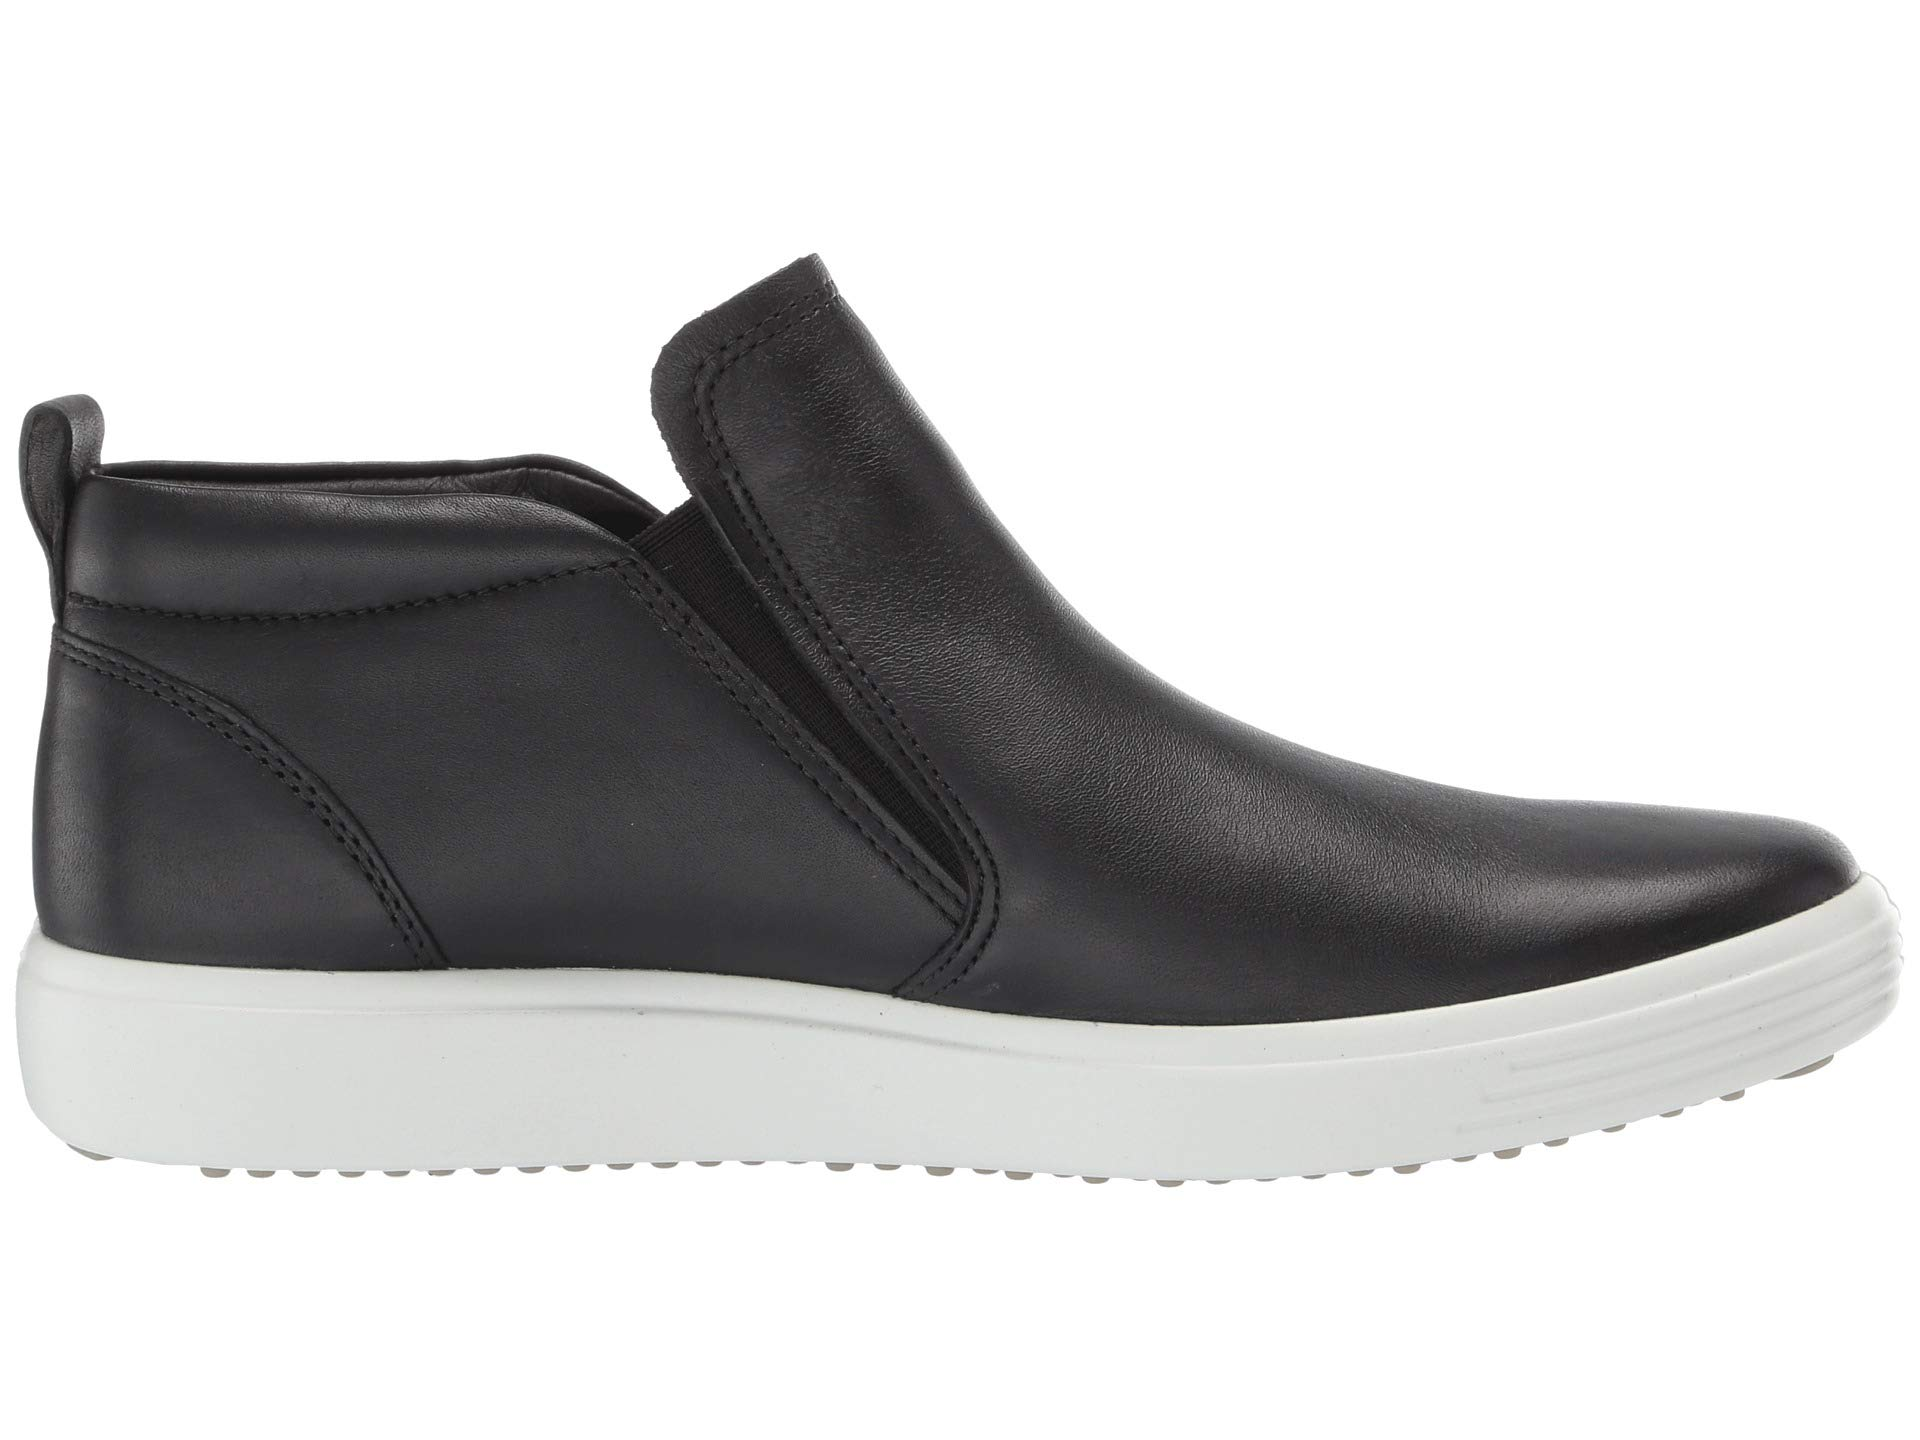 Leather Ecco Cow Black on Boot 7 Soft Slip awx0wqOTF